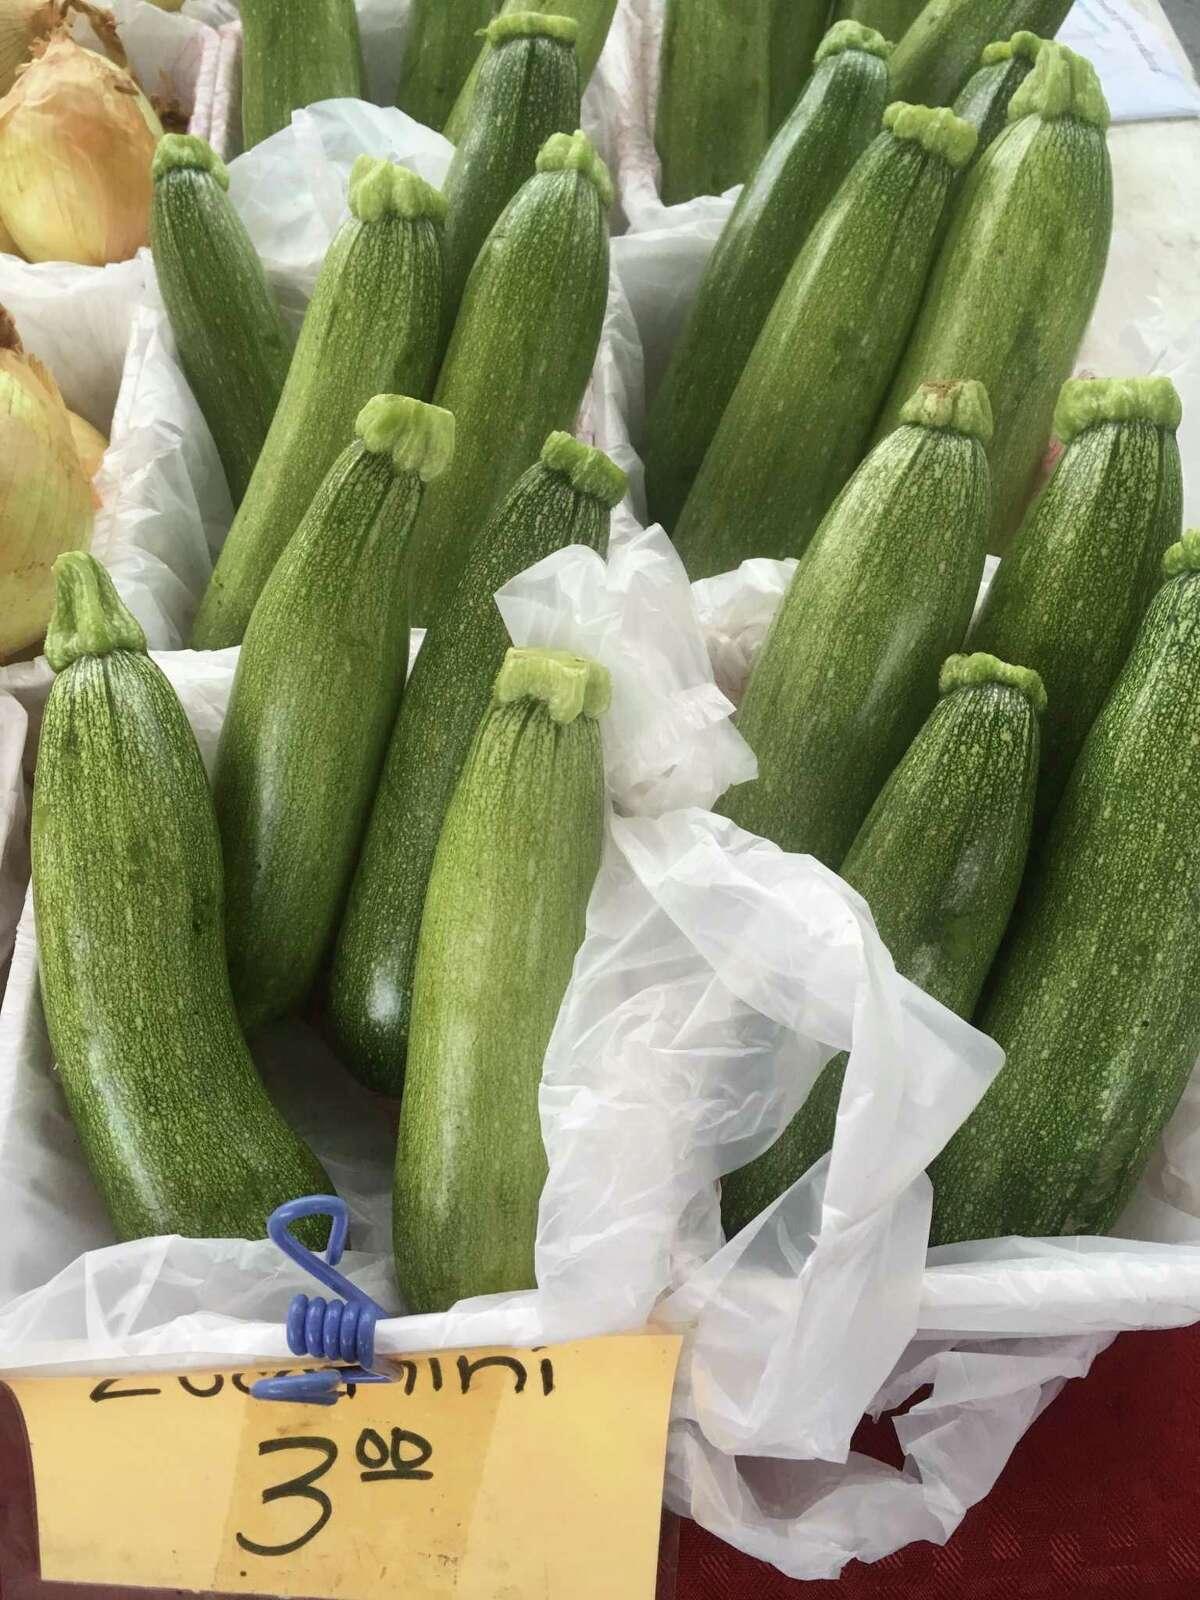 The zucchini crop is in full abundance at San Antonio area farmers markets.